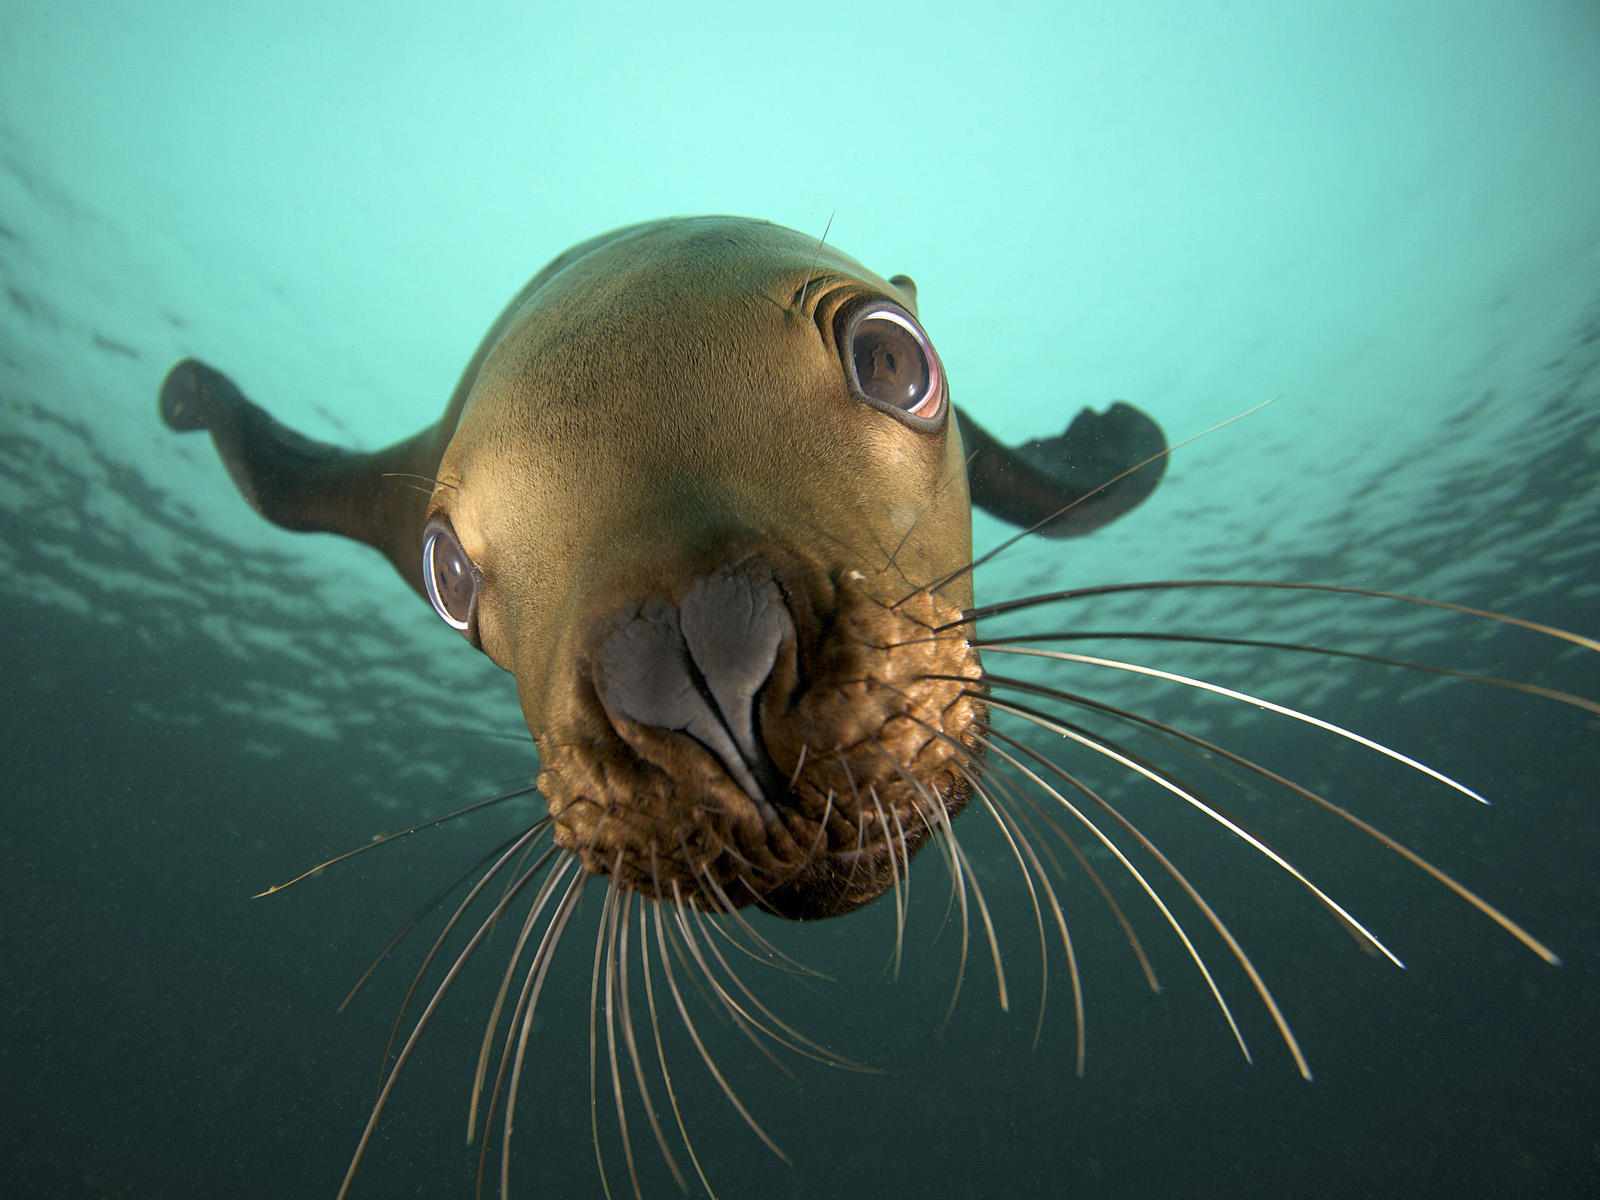 Sea Lion 9637 1600x1200 px